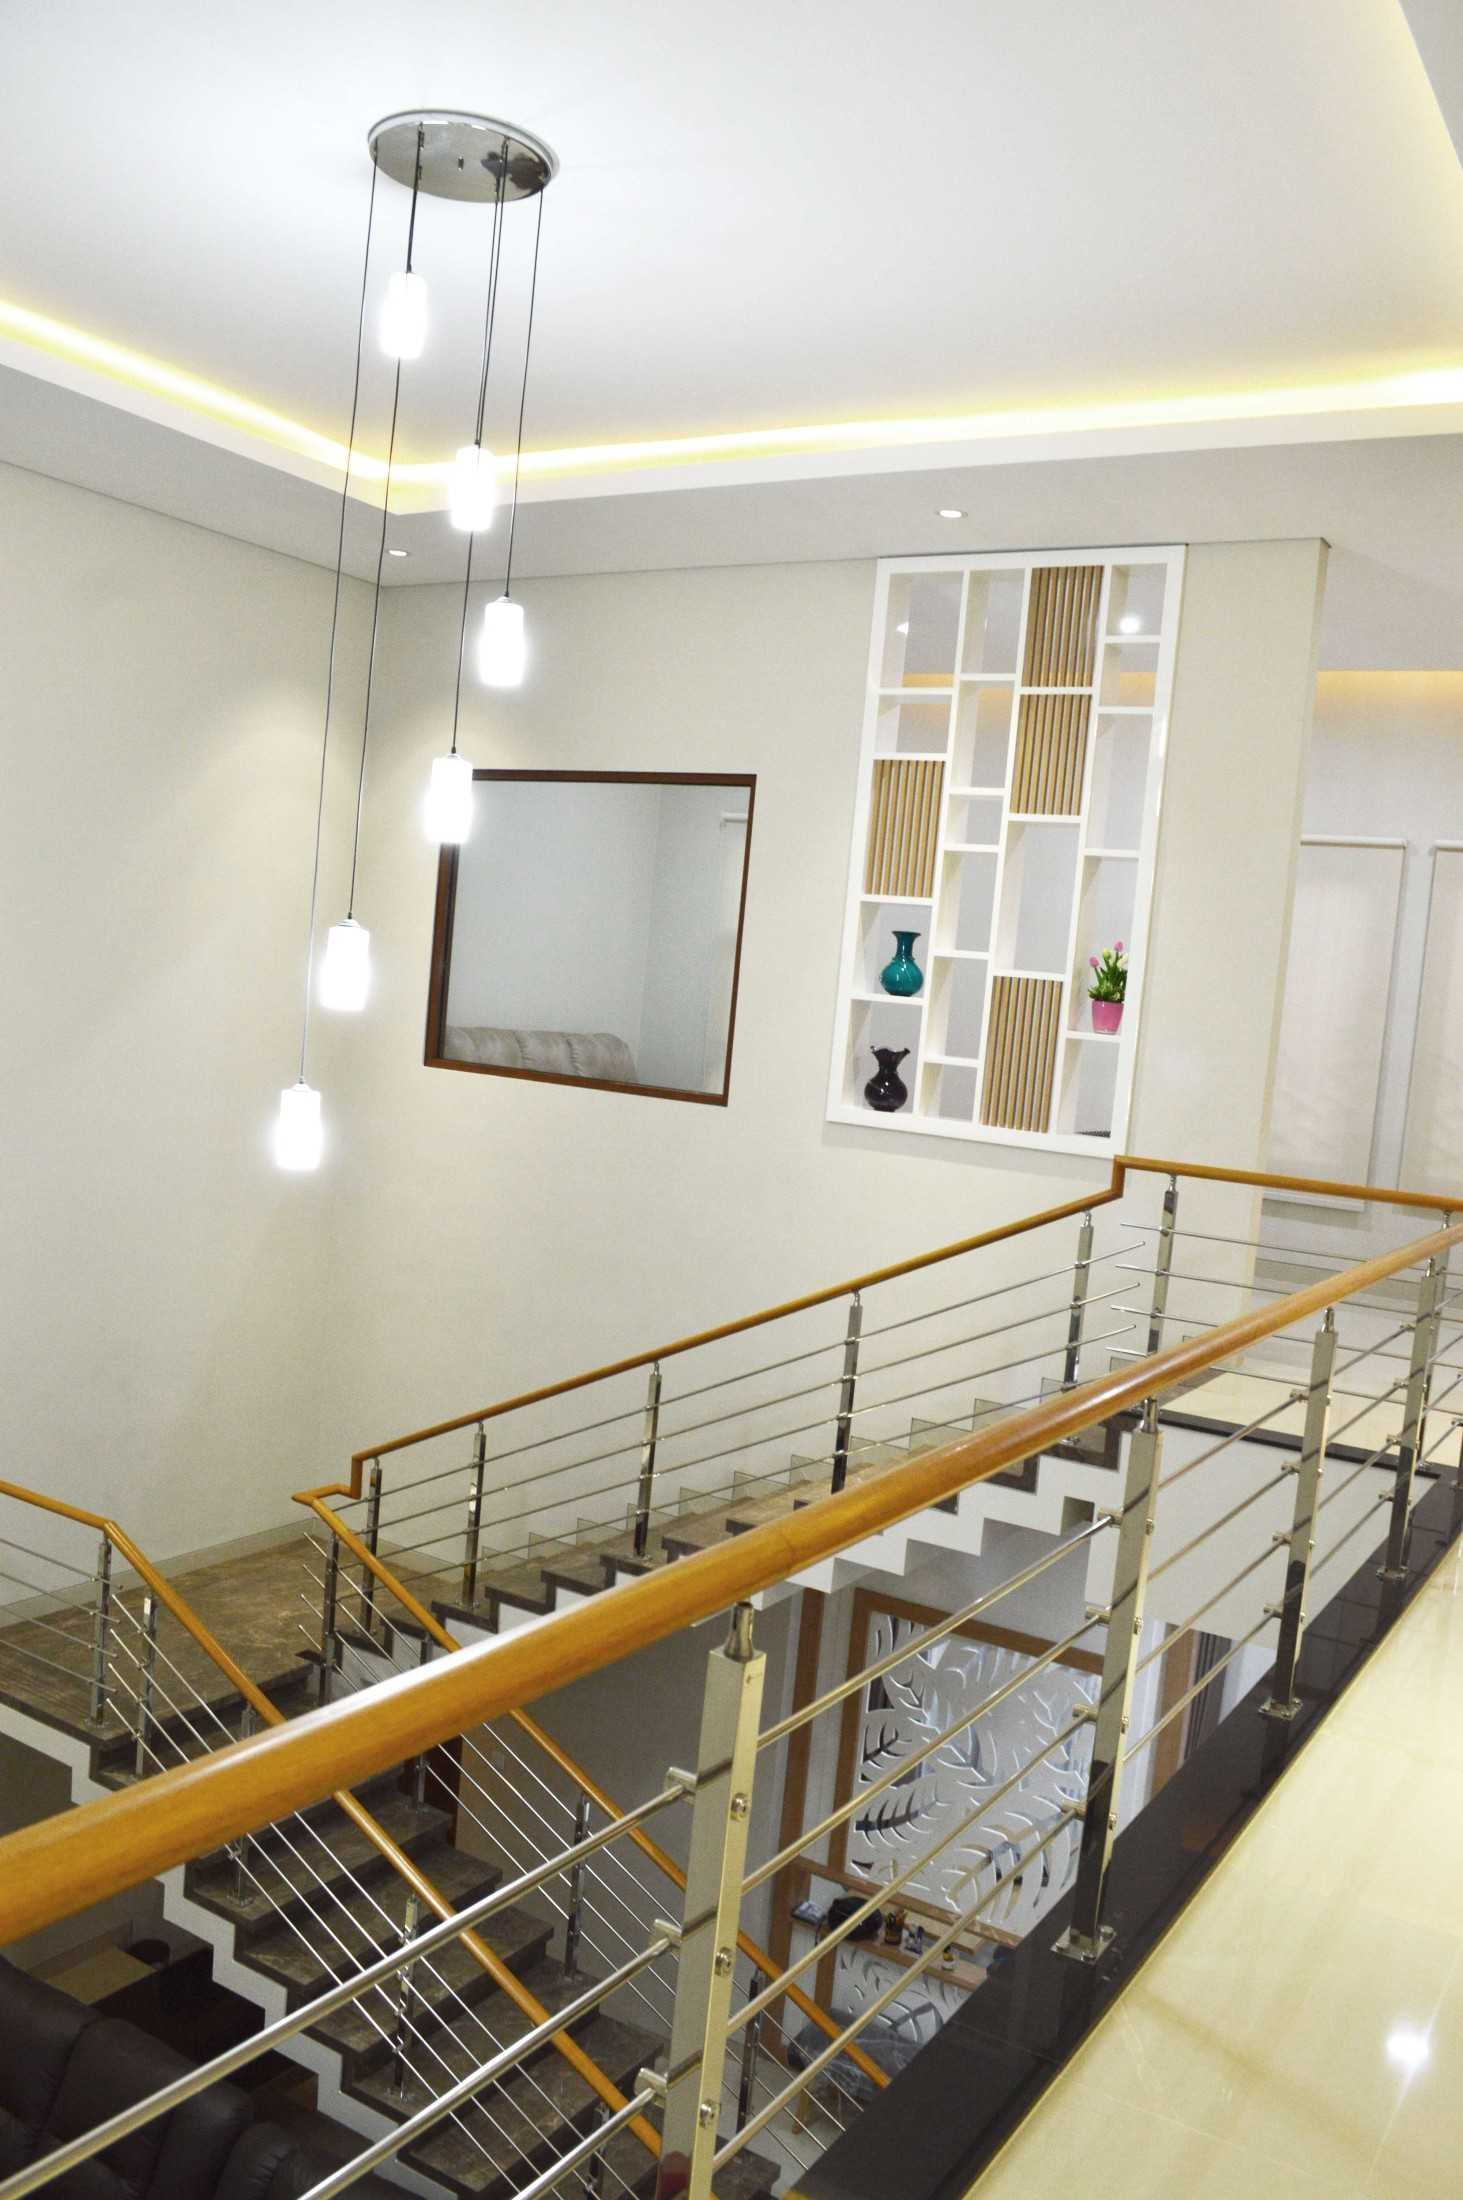 Conarch Studio Modern House With Natural Color Palette Surakarta, Kota Surakarta, Jawa Tengah, Indonesia Surakarta, Kota Surakarta, Jawa Tengah, Indonesia Stairs To The Void  122982